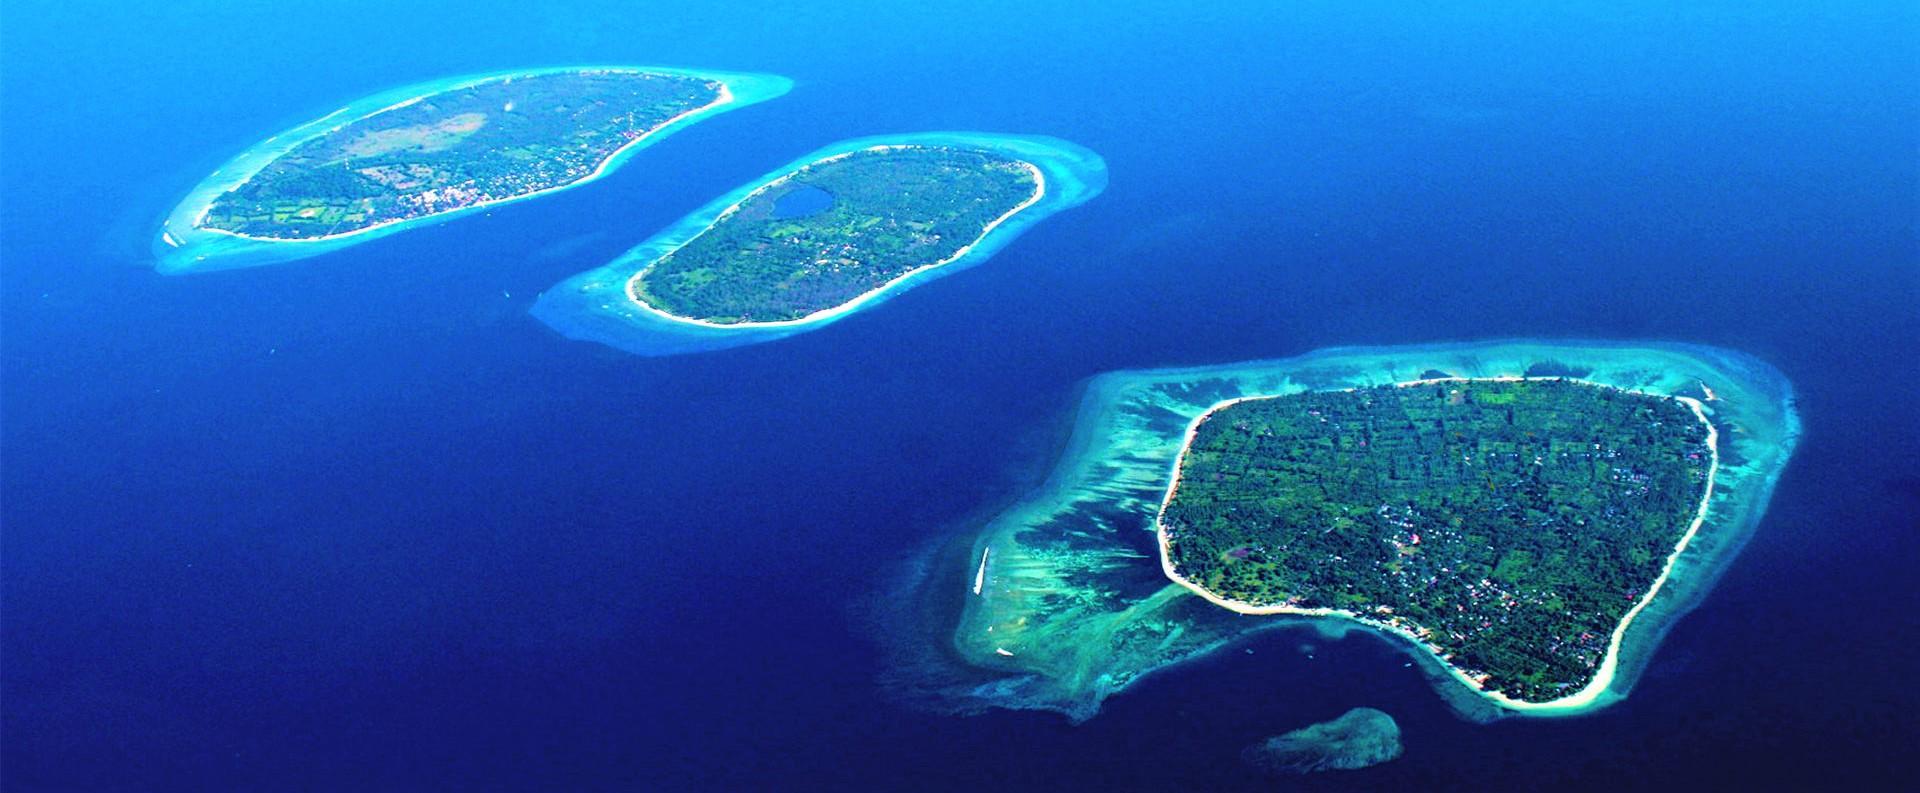 Gili Islands The Bali Bible